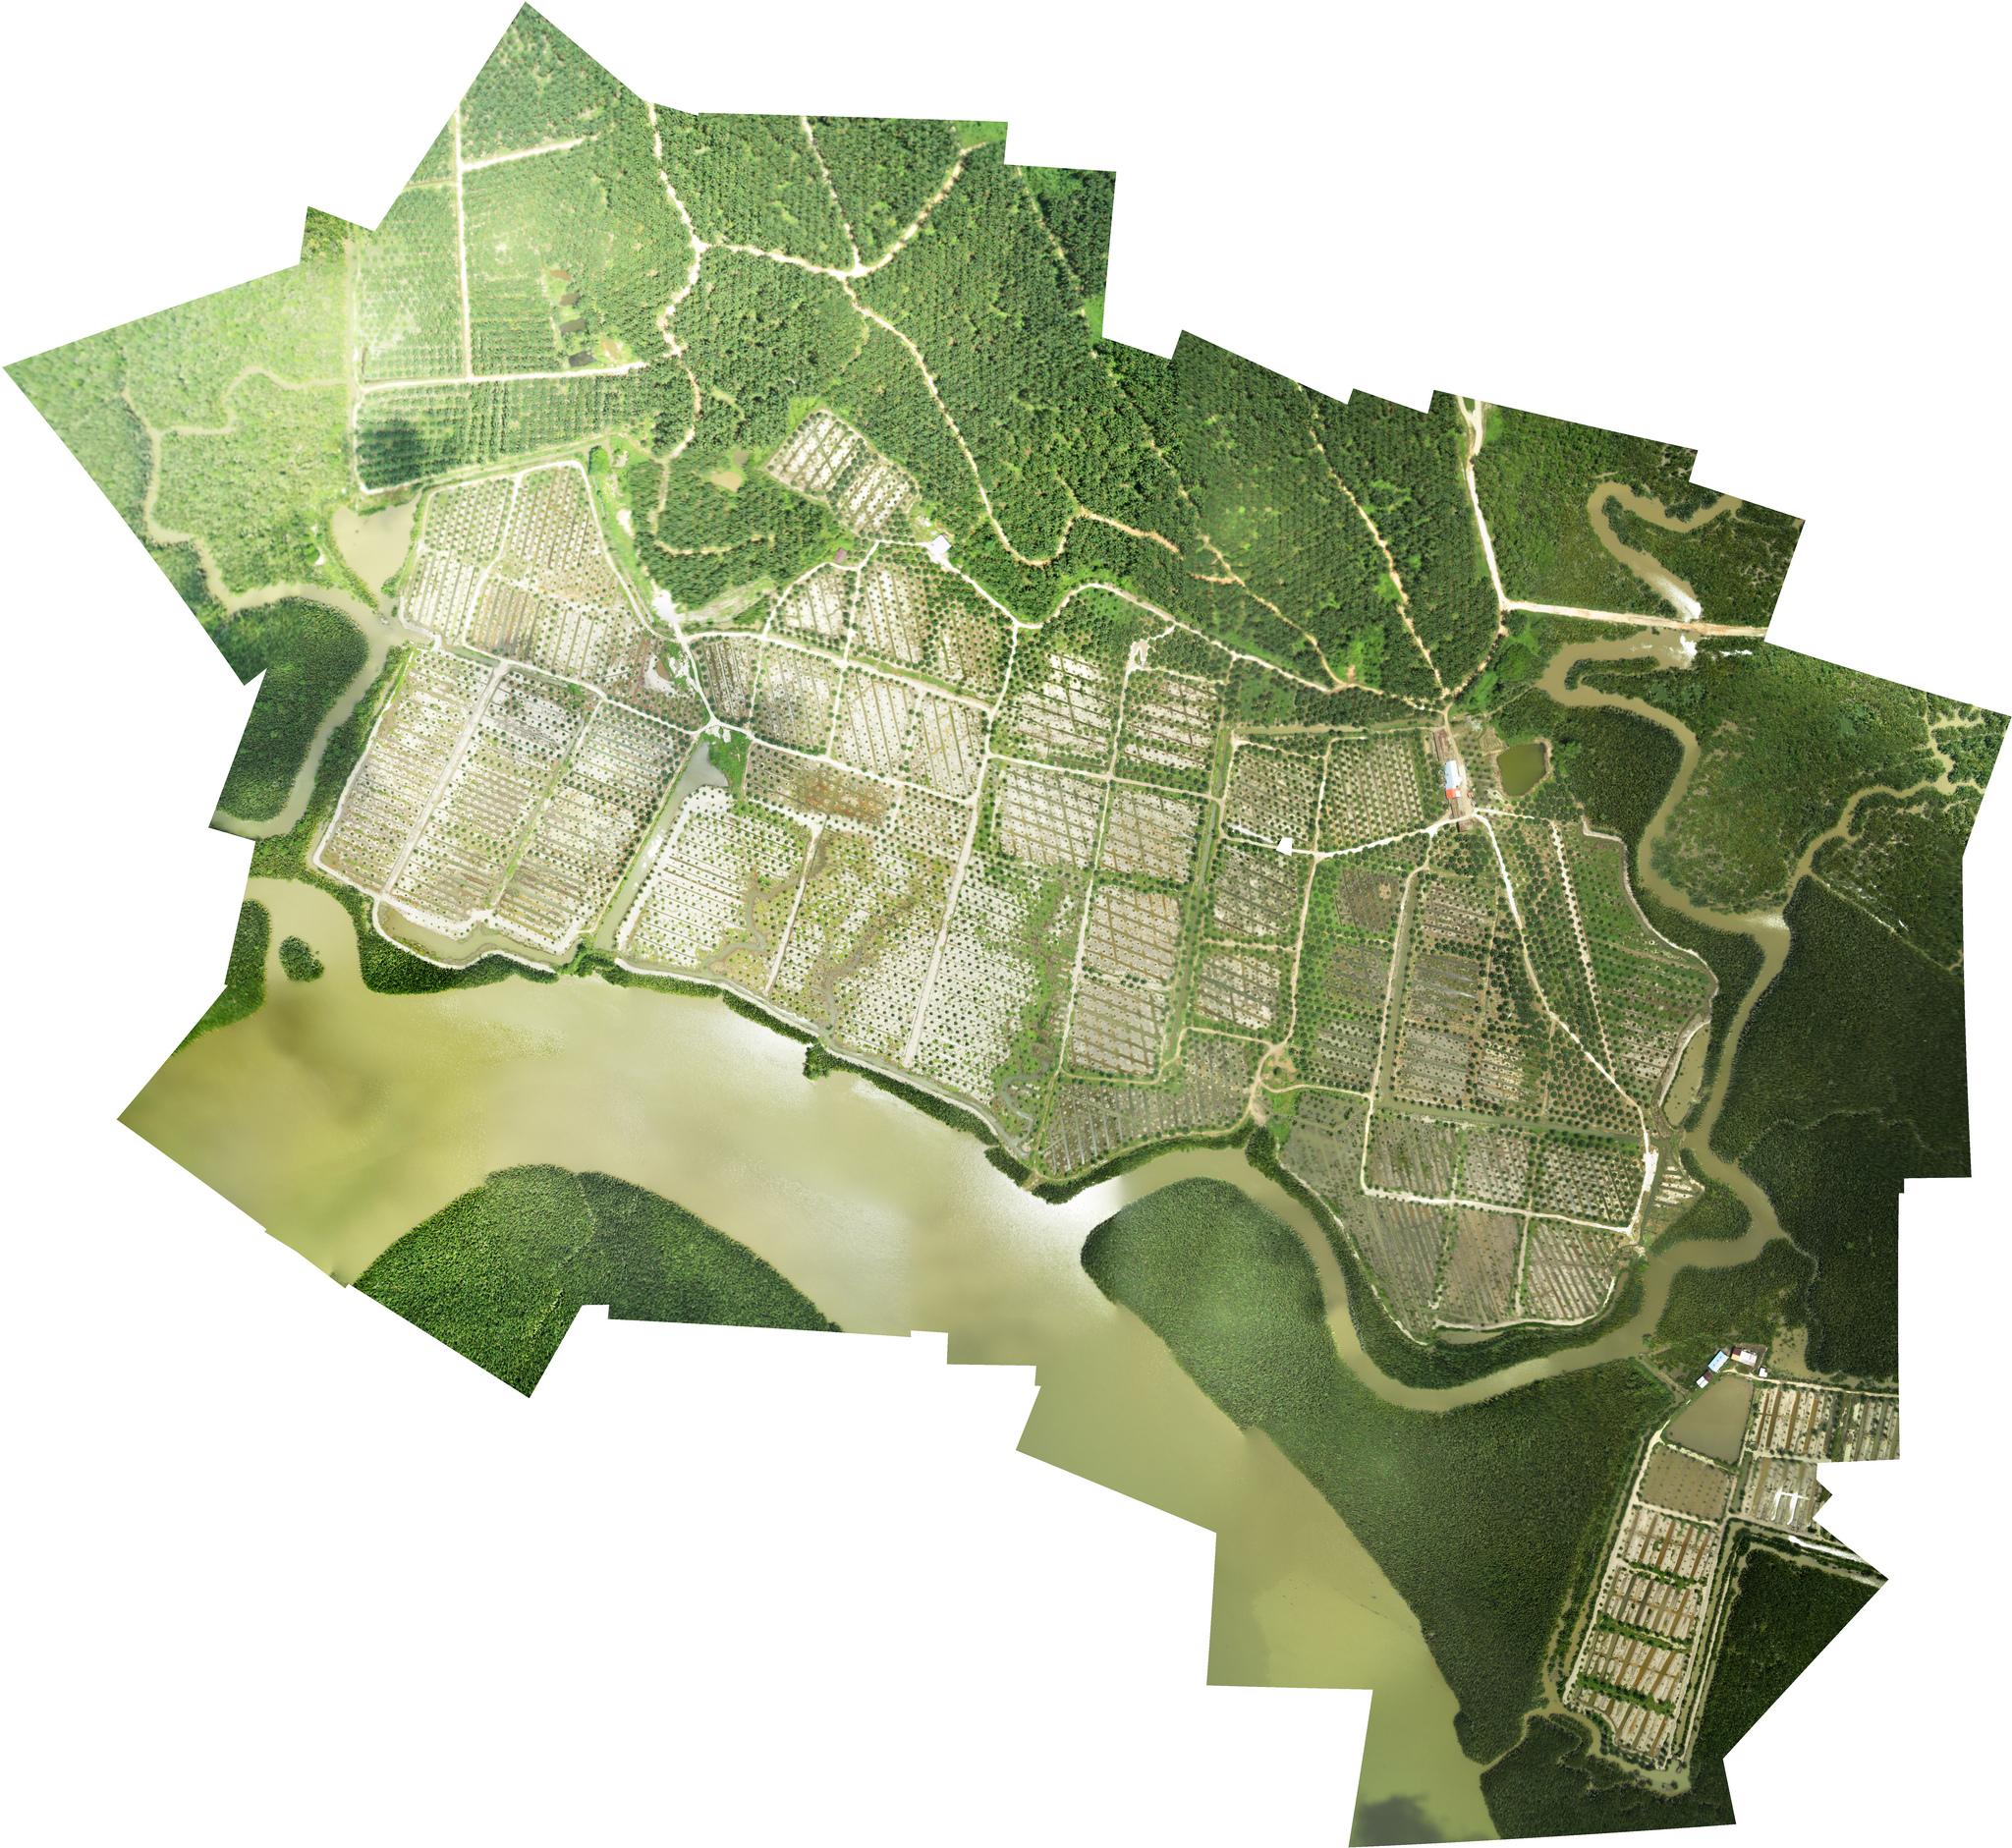 Conservation Drones - Google drone maps